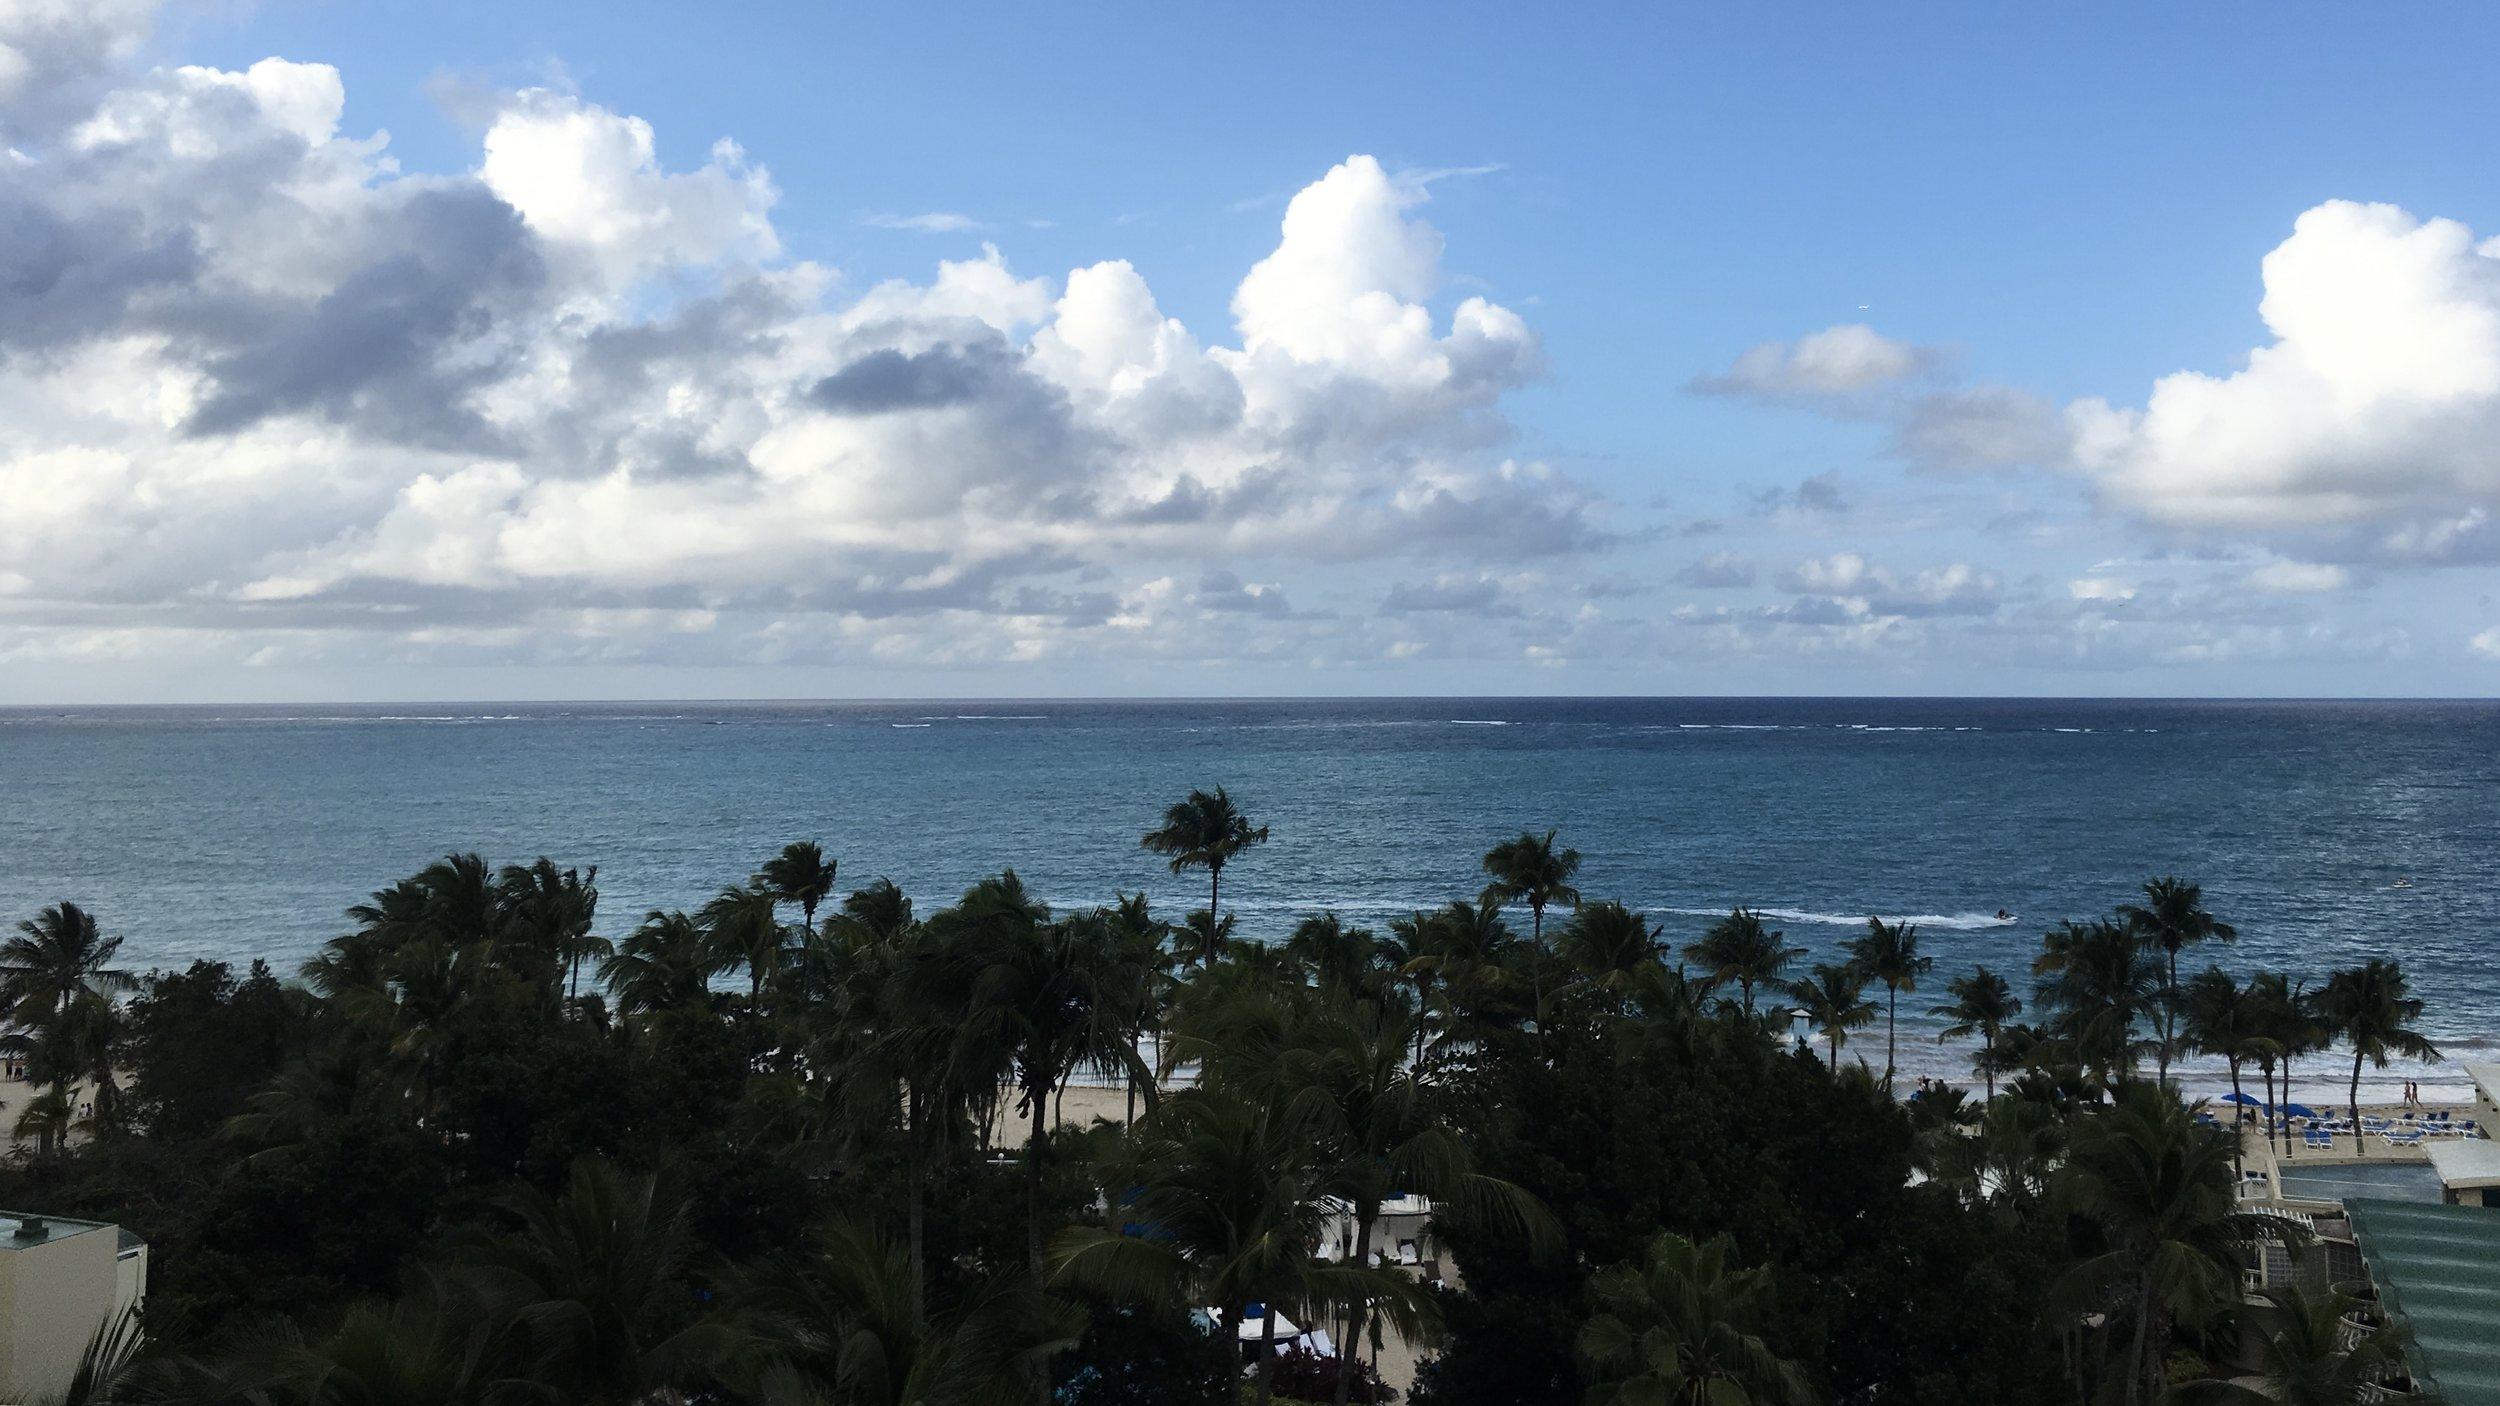 San Juan, Puerto Rico. February 2016